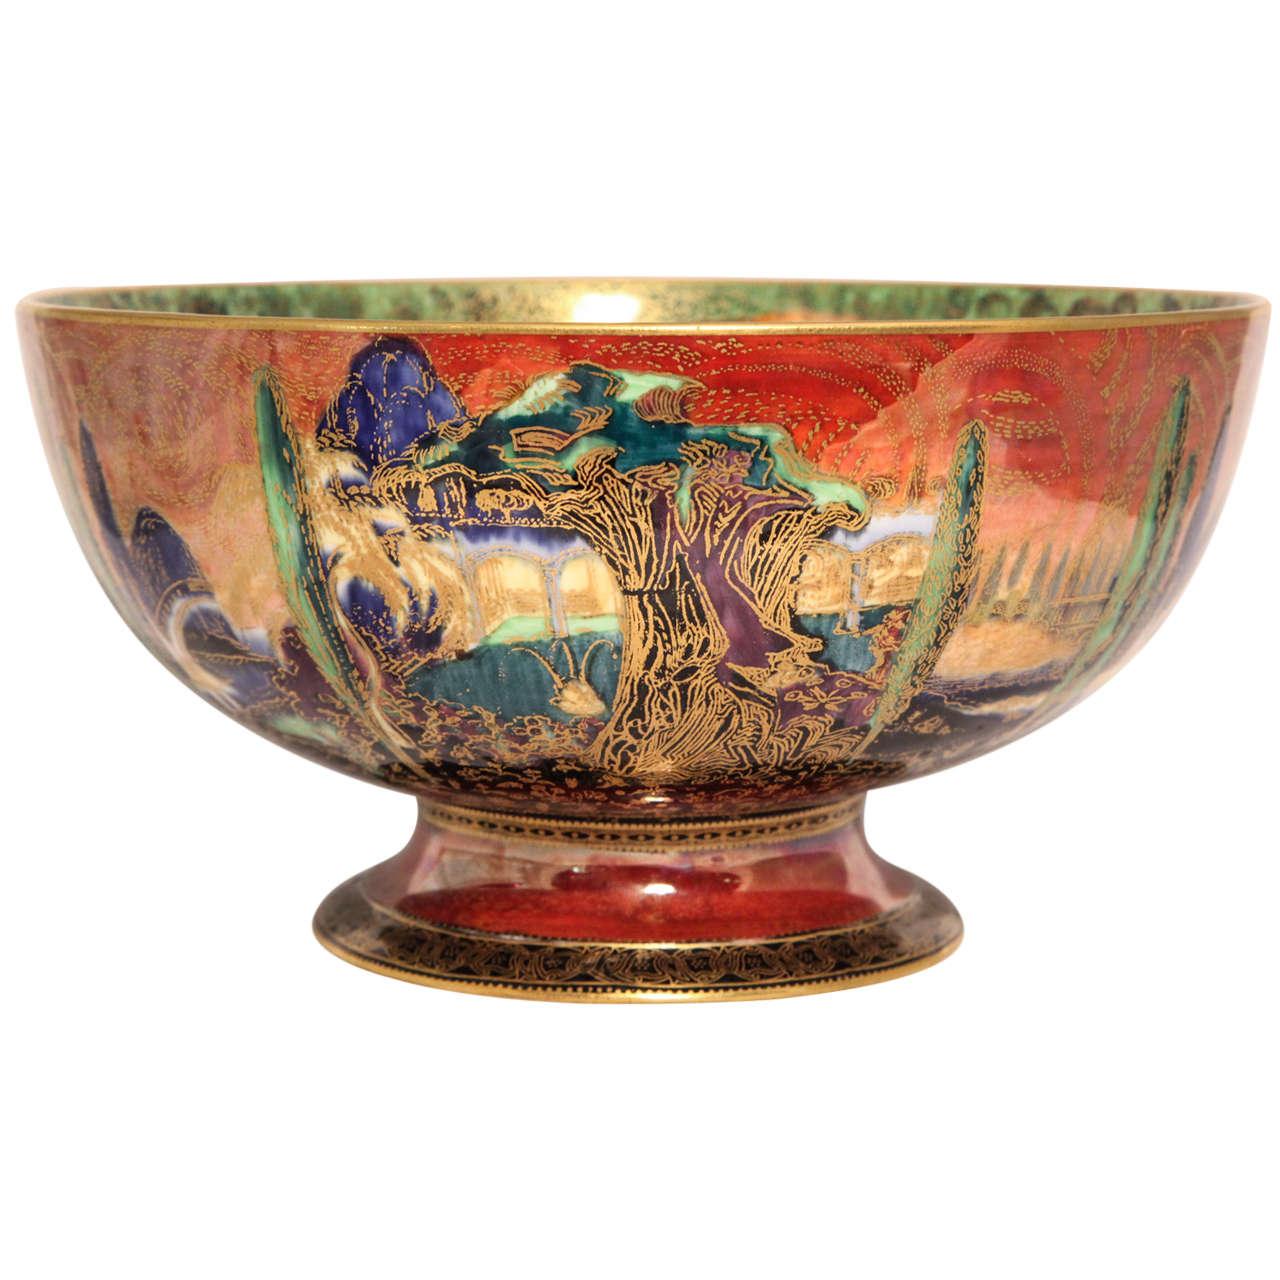 Rare Wedgwood Fairyland Lustre Footed Bowl At 1stdibs